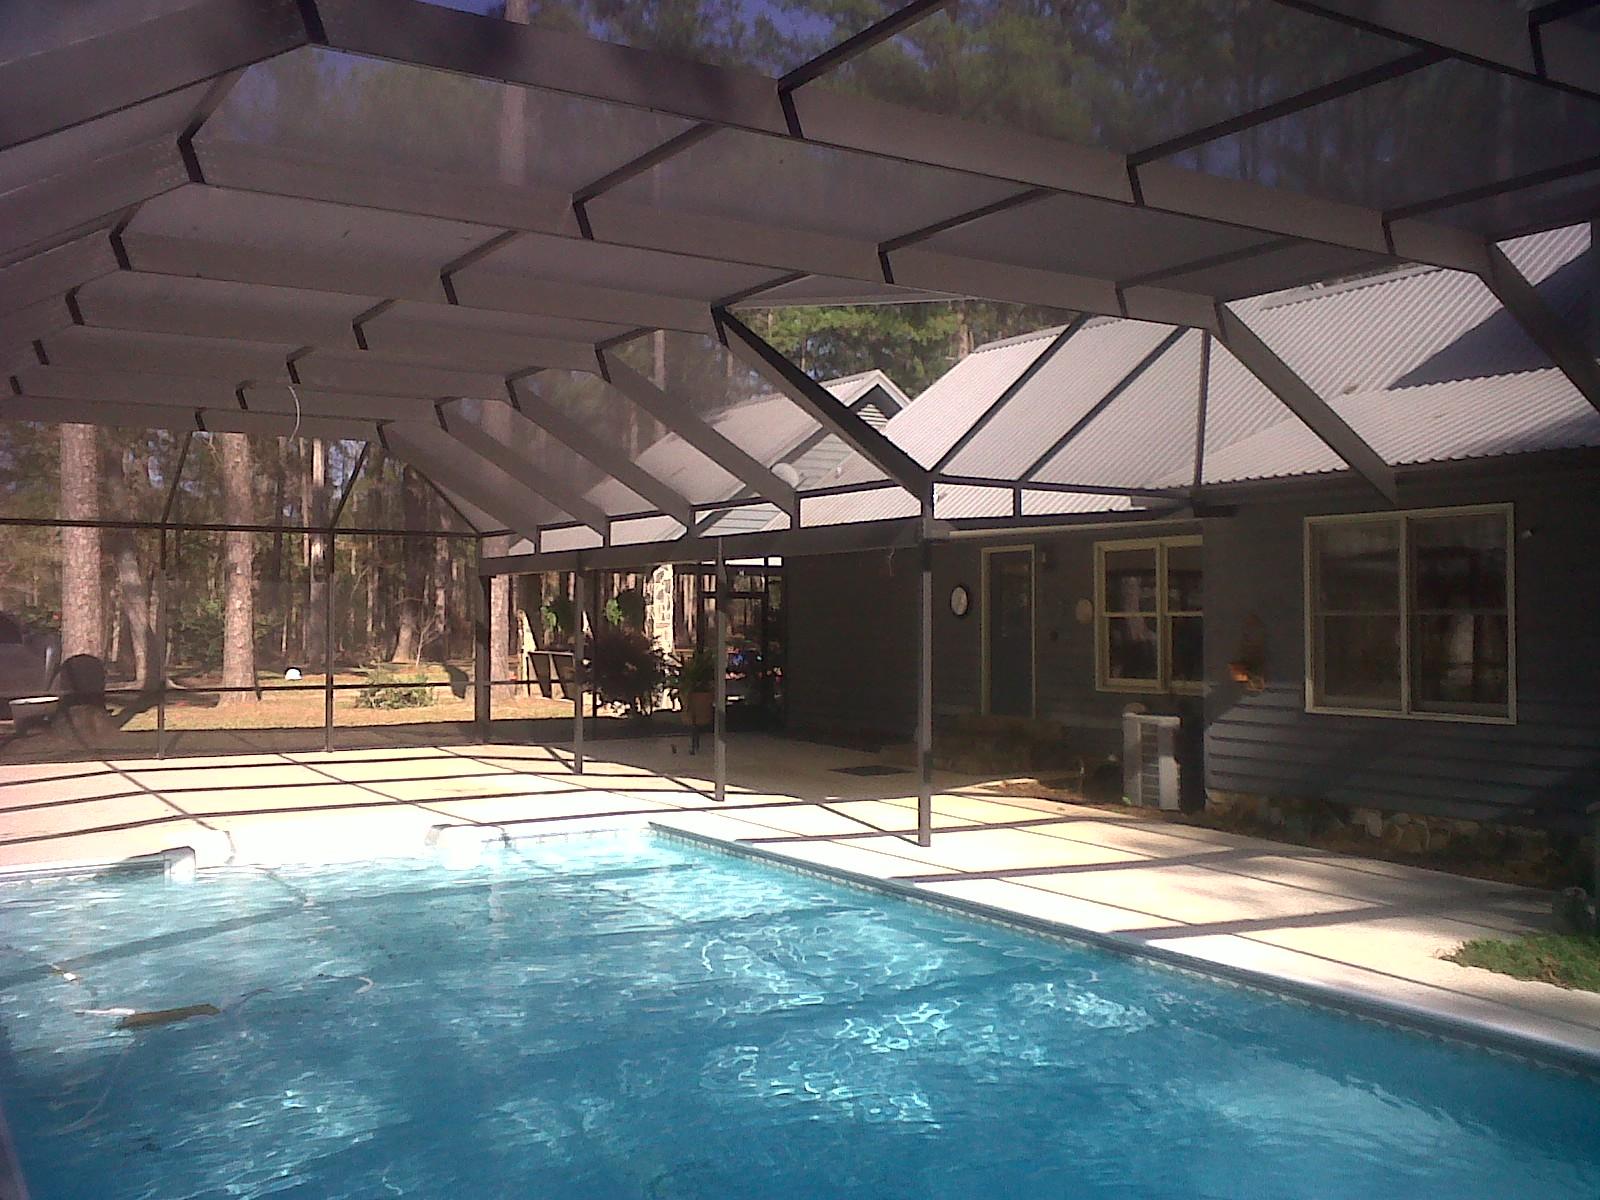 Pool enclosures usa bainbridge georgia pool enclosures for Pool enclosures prices